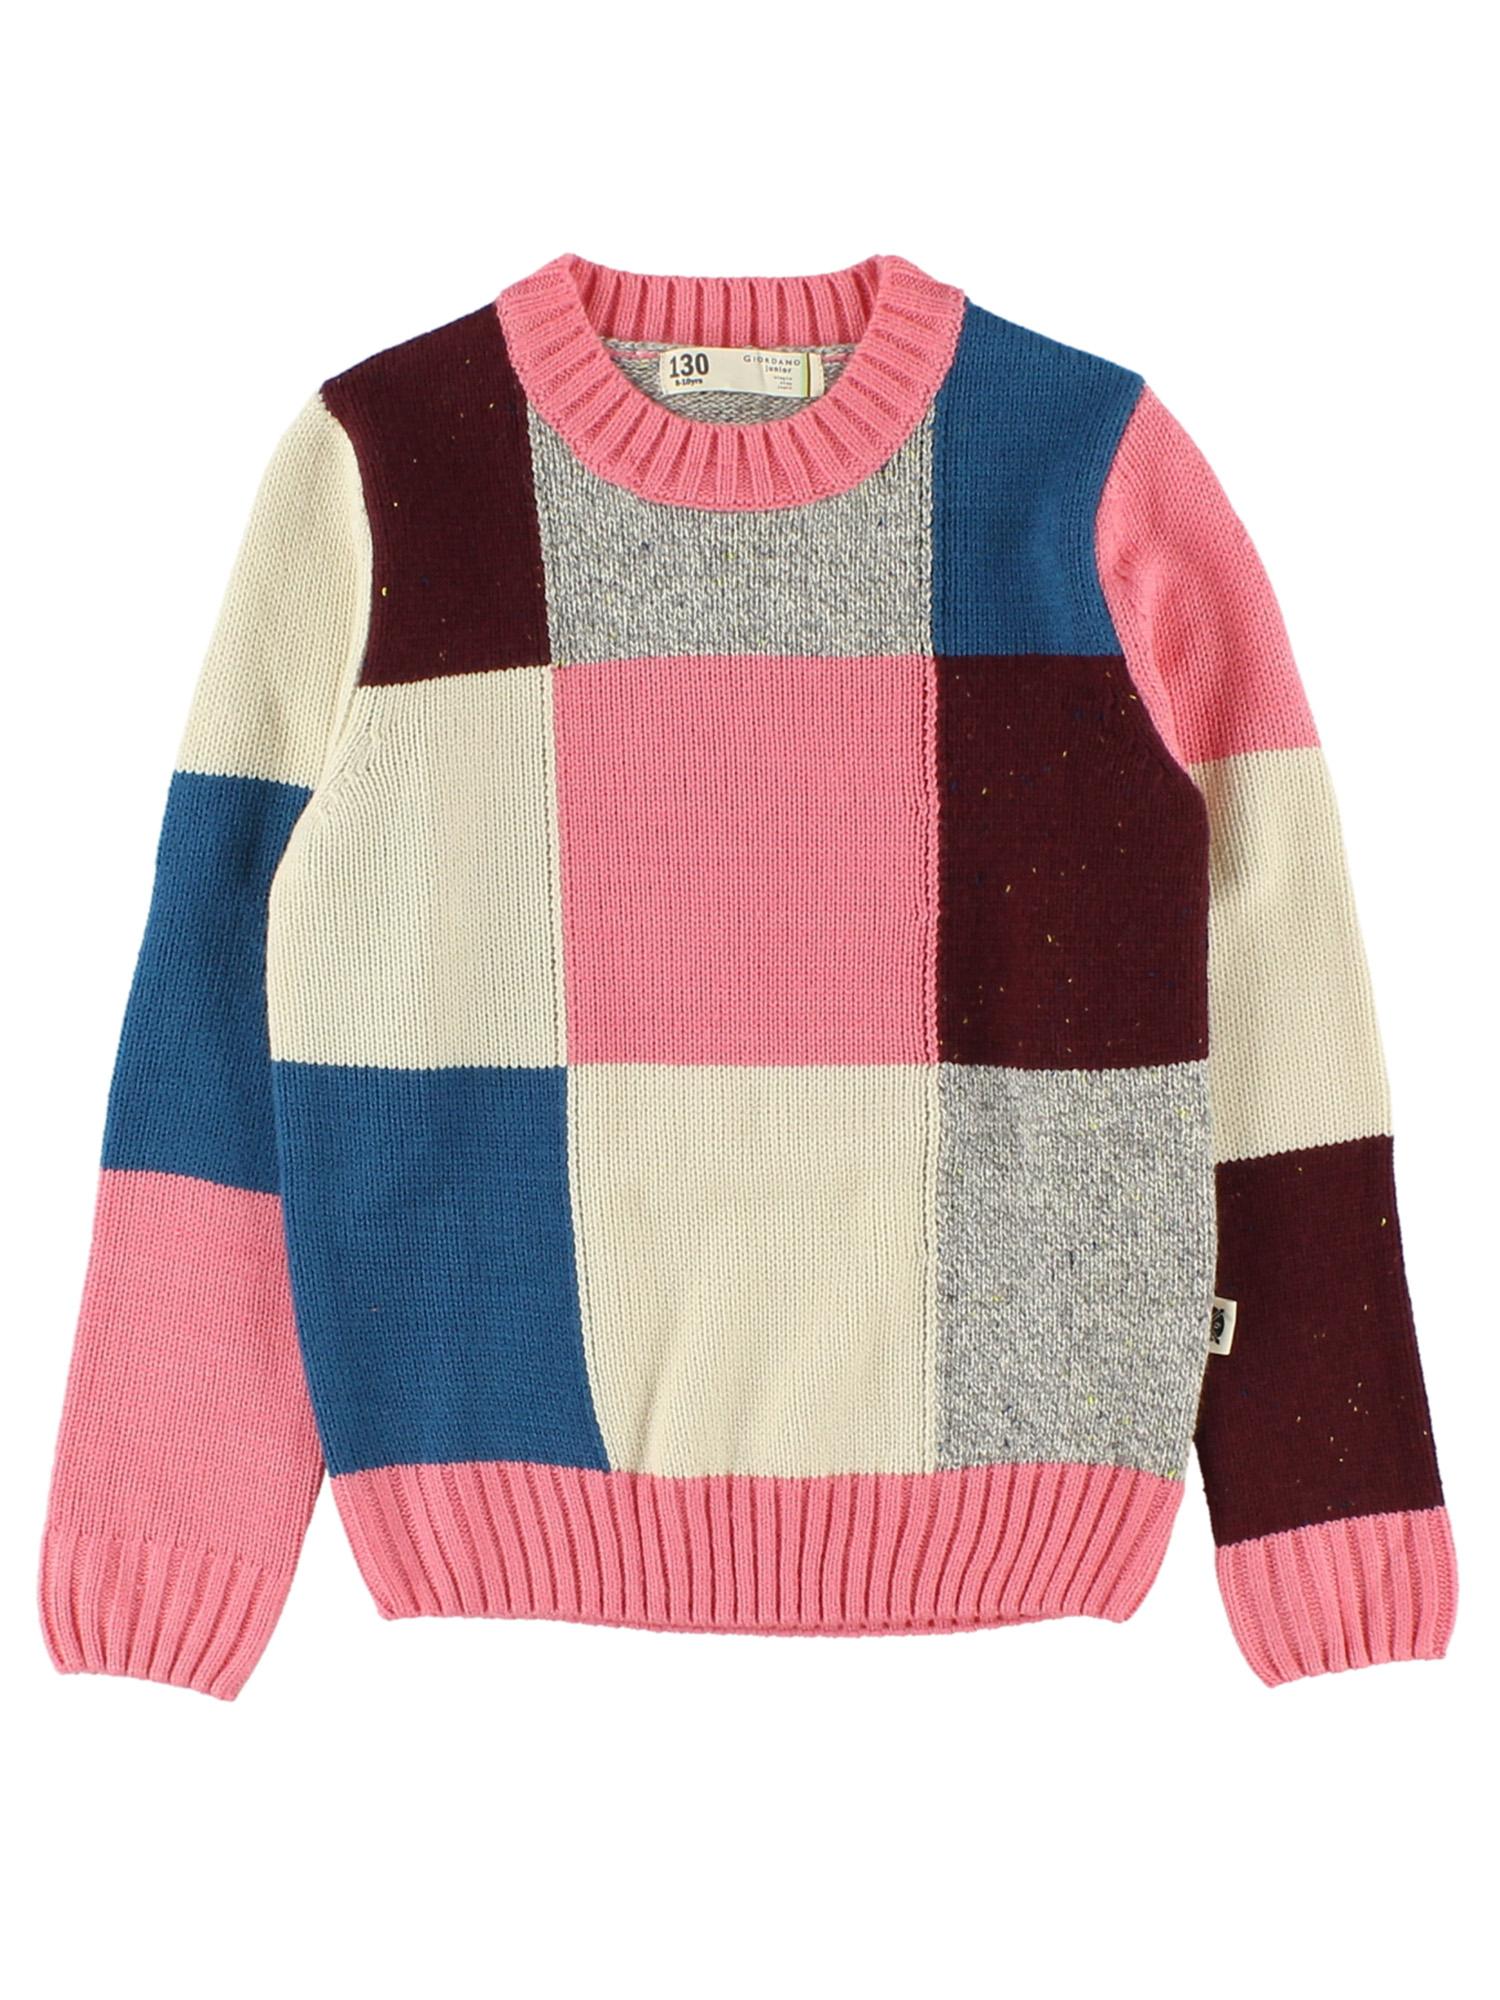 [GIORDANO]ローゲージチェック柄セーター